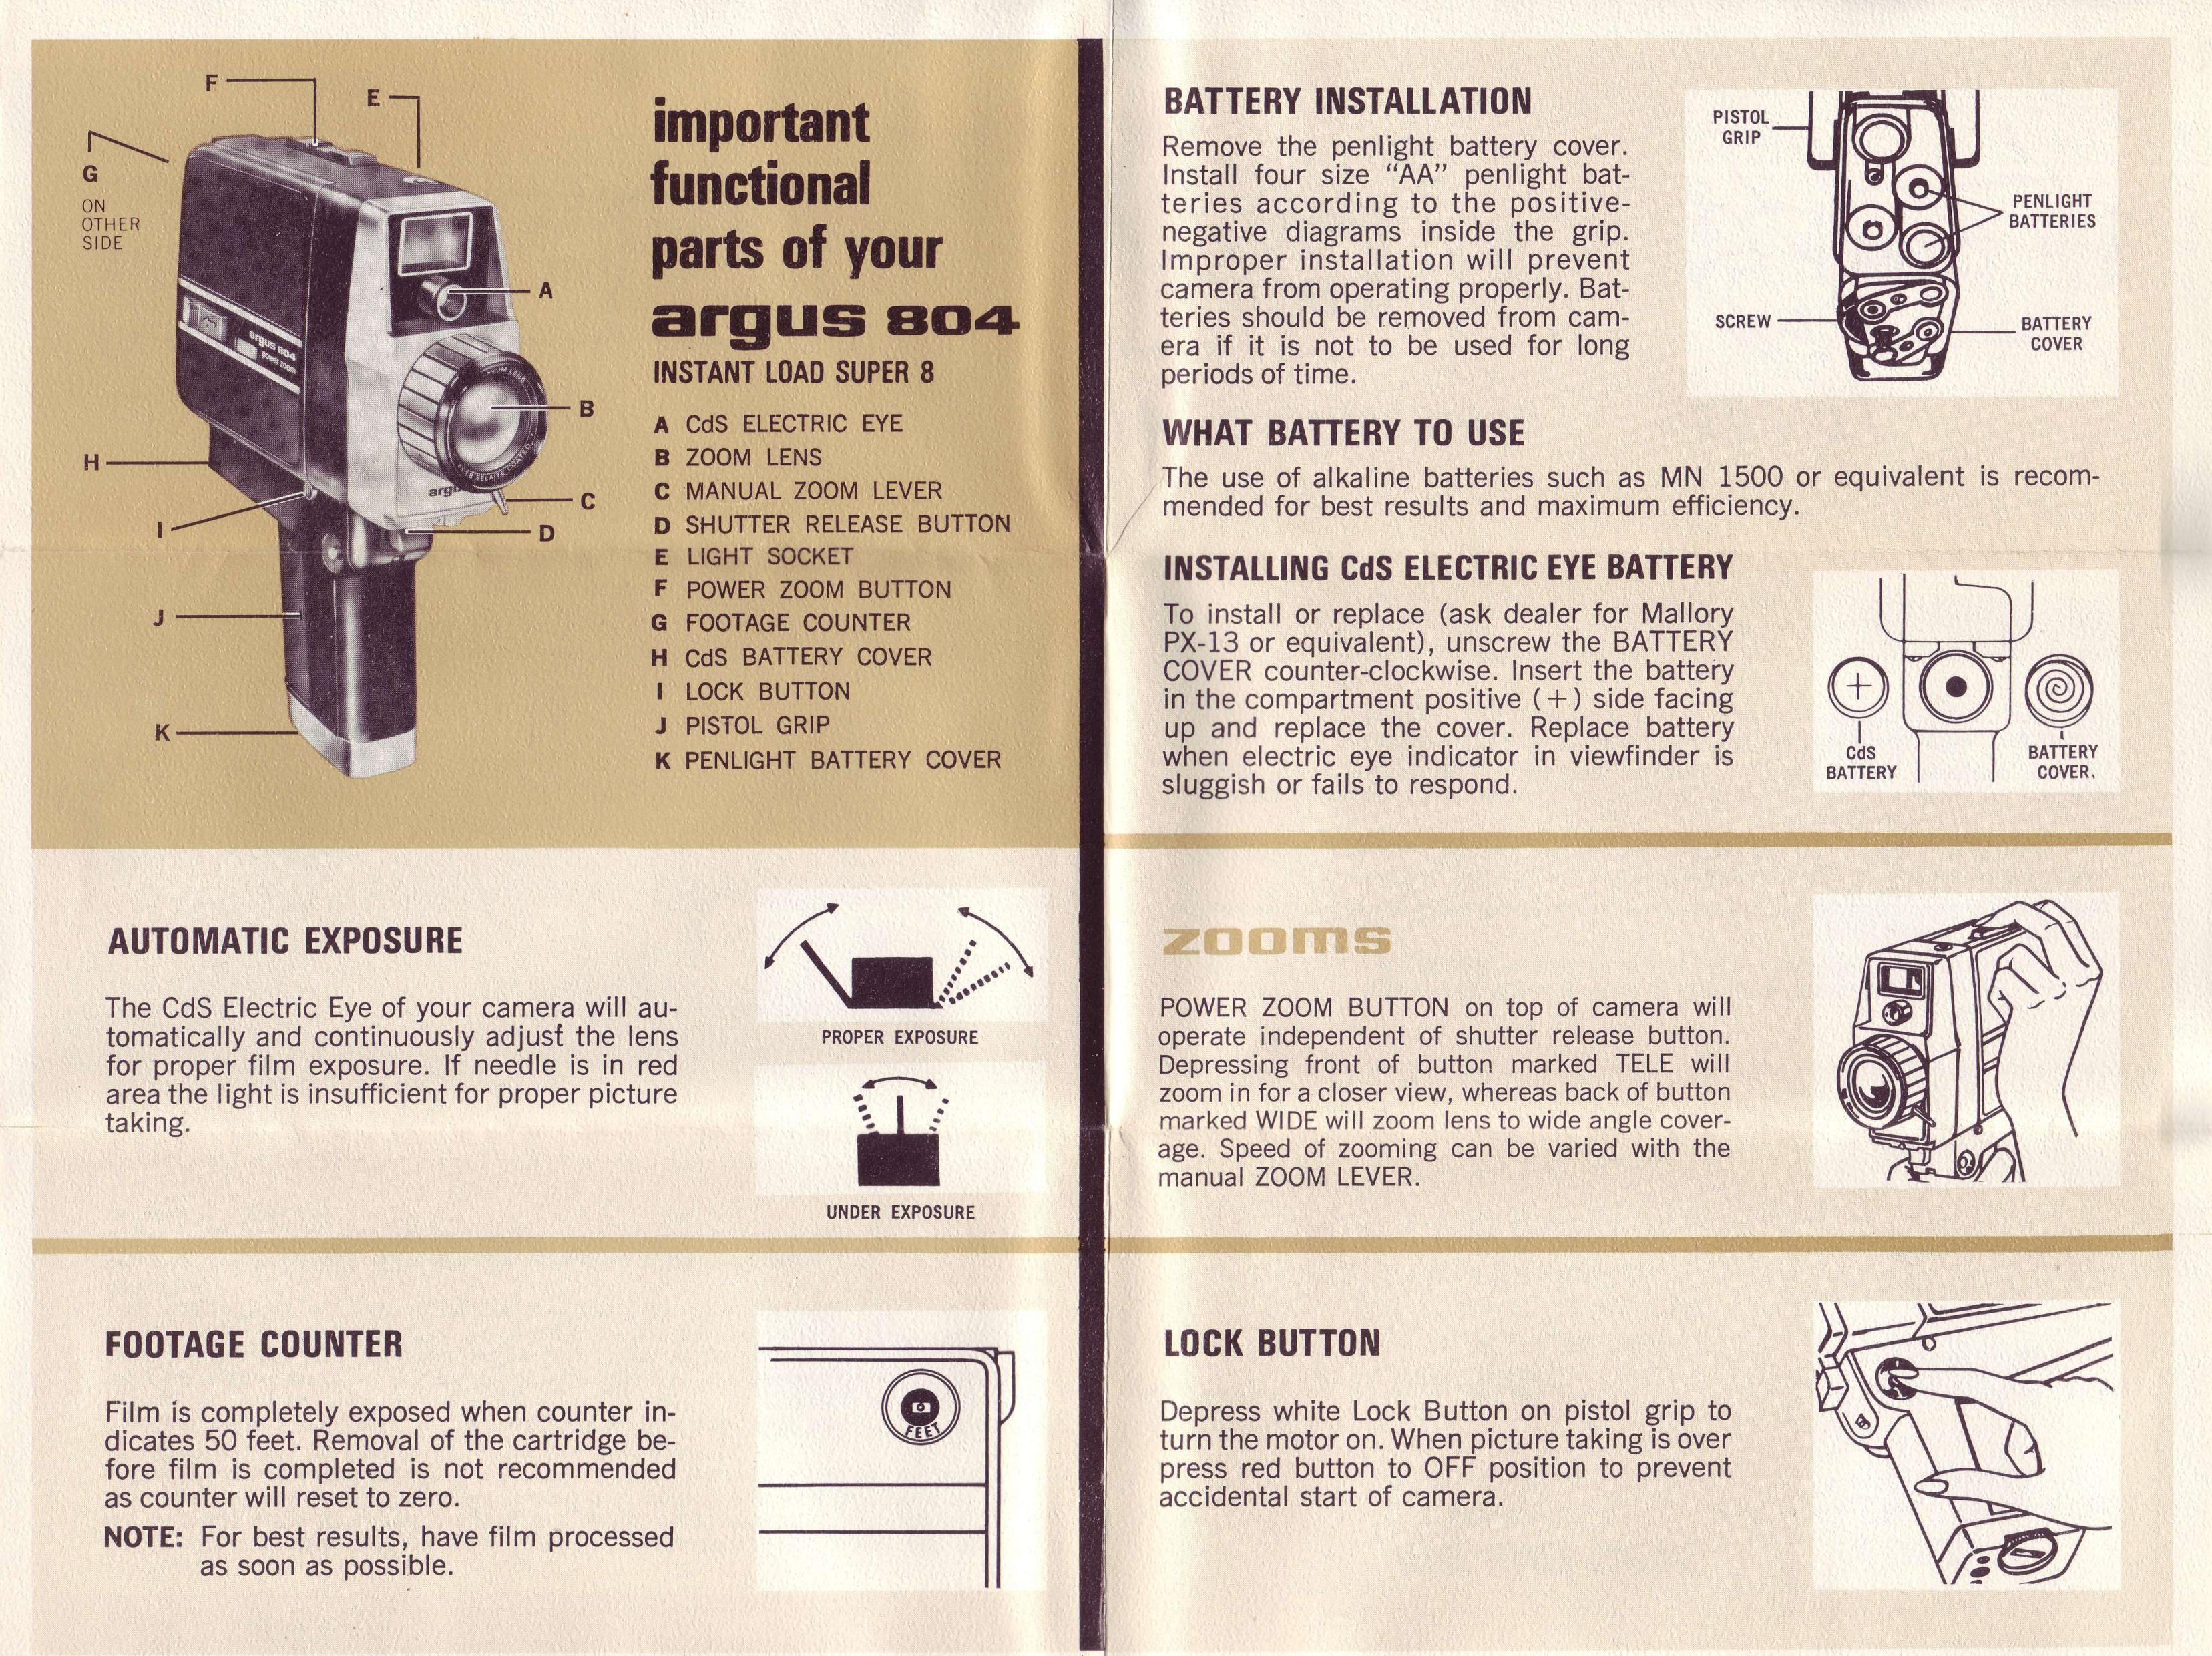 argus 804 power zoom movie camera instruction manual ann arbor rh aadl org camera instruction manual e-m10 camera instruction manual nikon